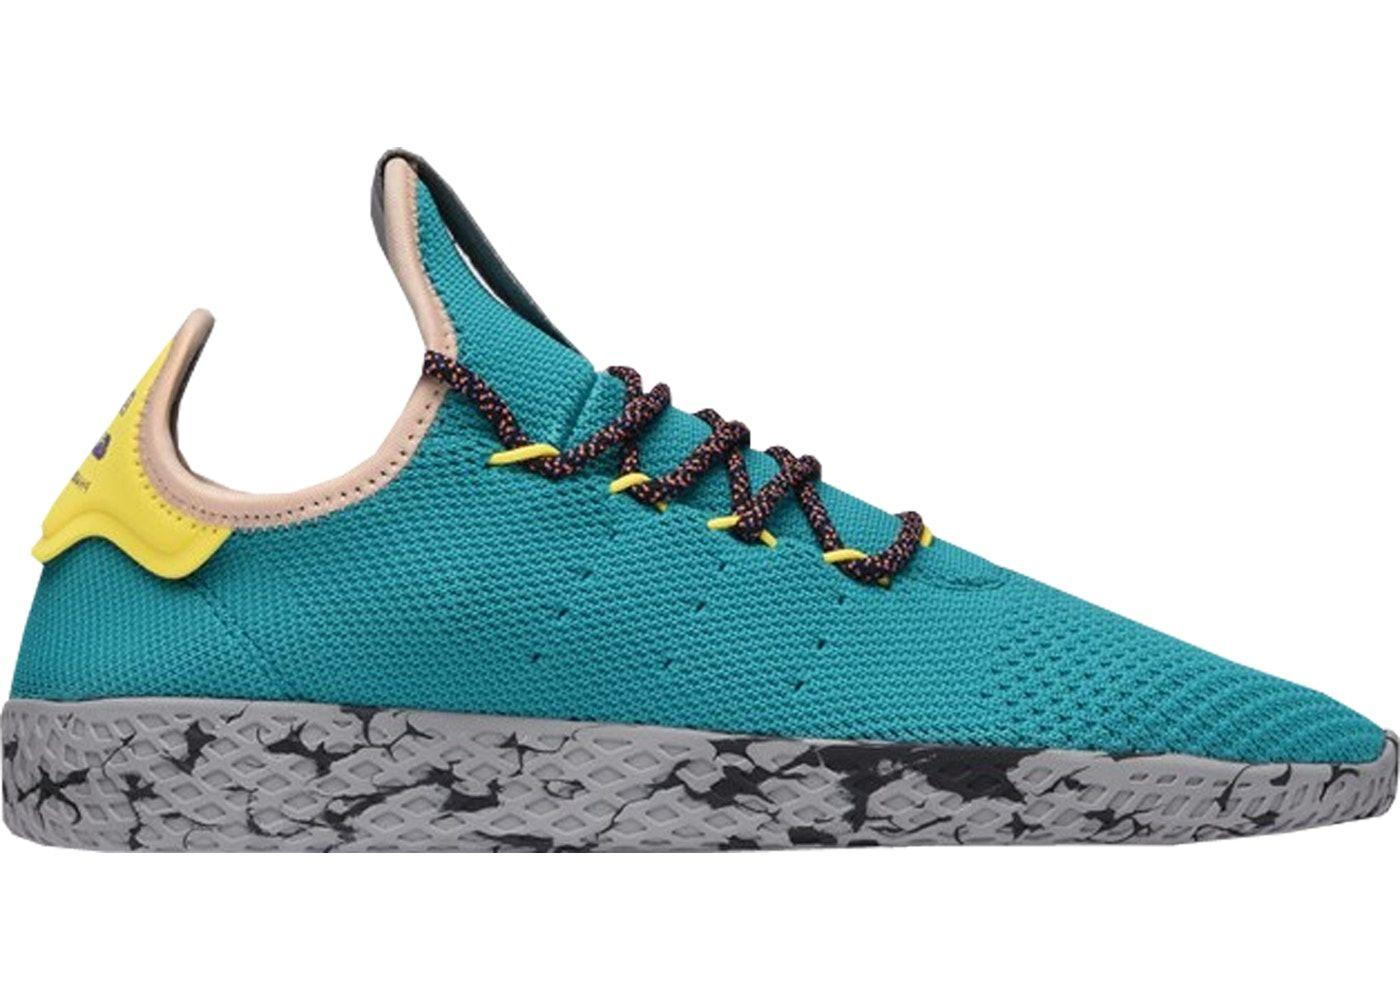 adidas Tennis HU Pharrell Teal in 2020